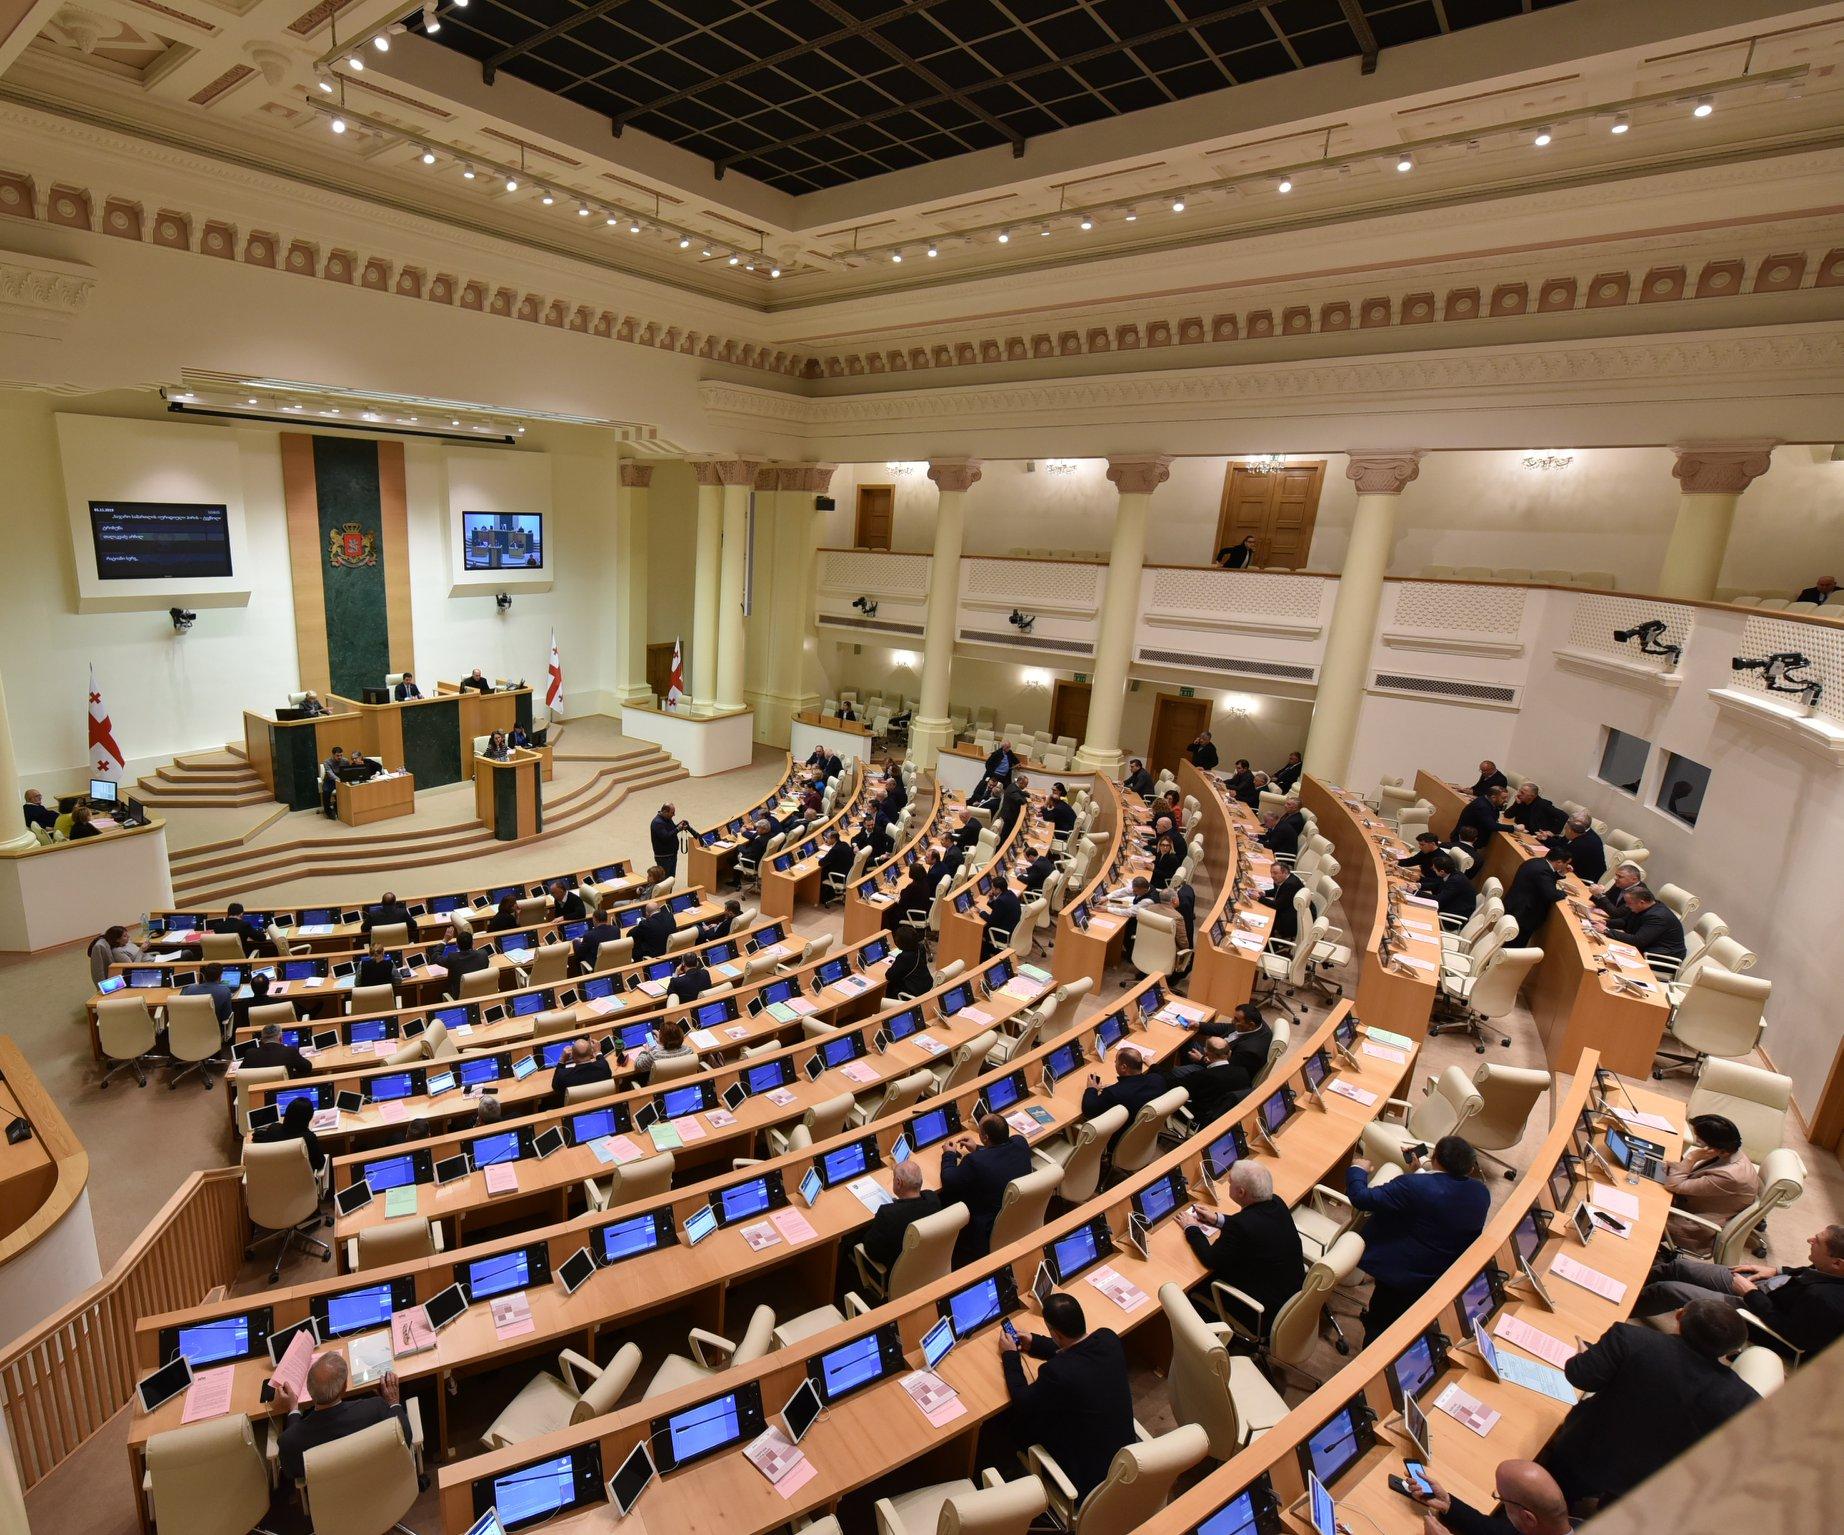 Parliament 26 #новости Грузинская мечта, коронавирус в Грузии, парламент Грузии